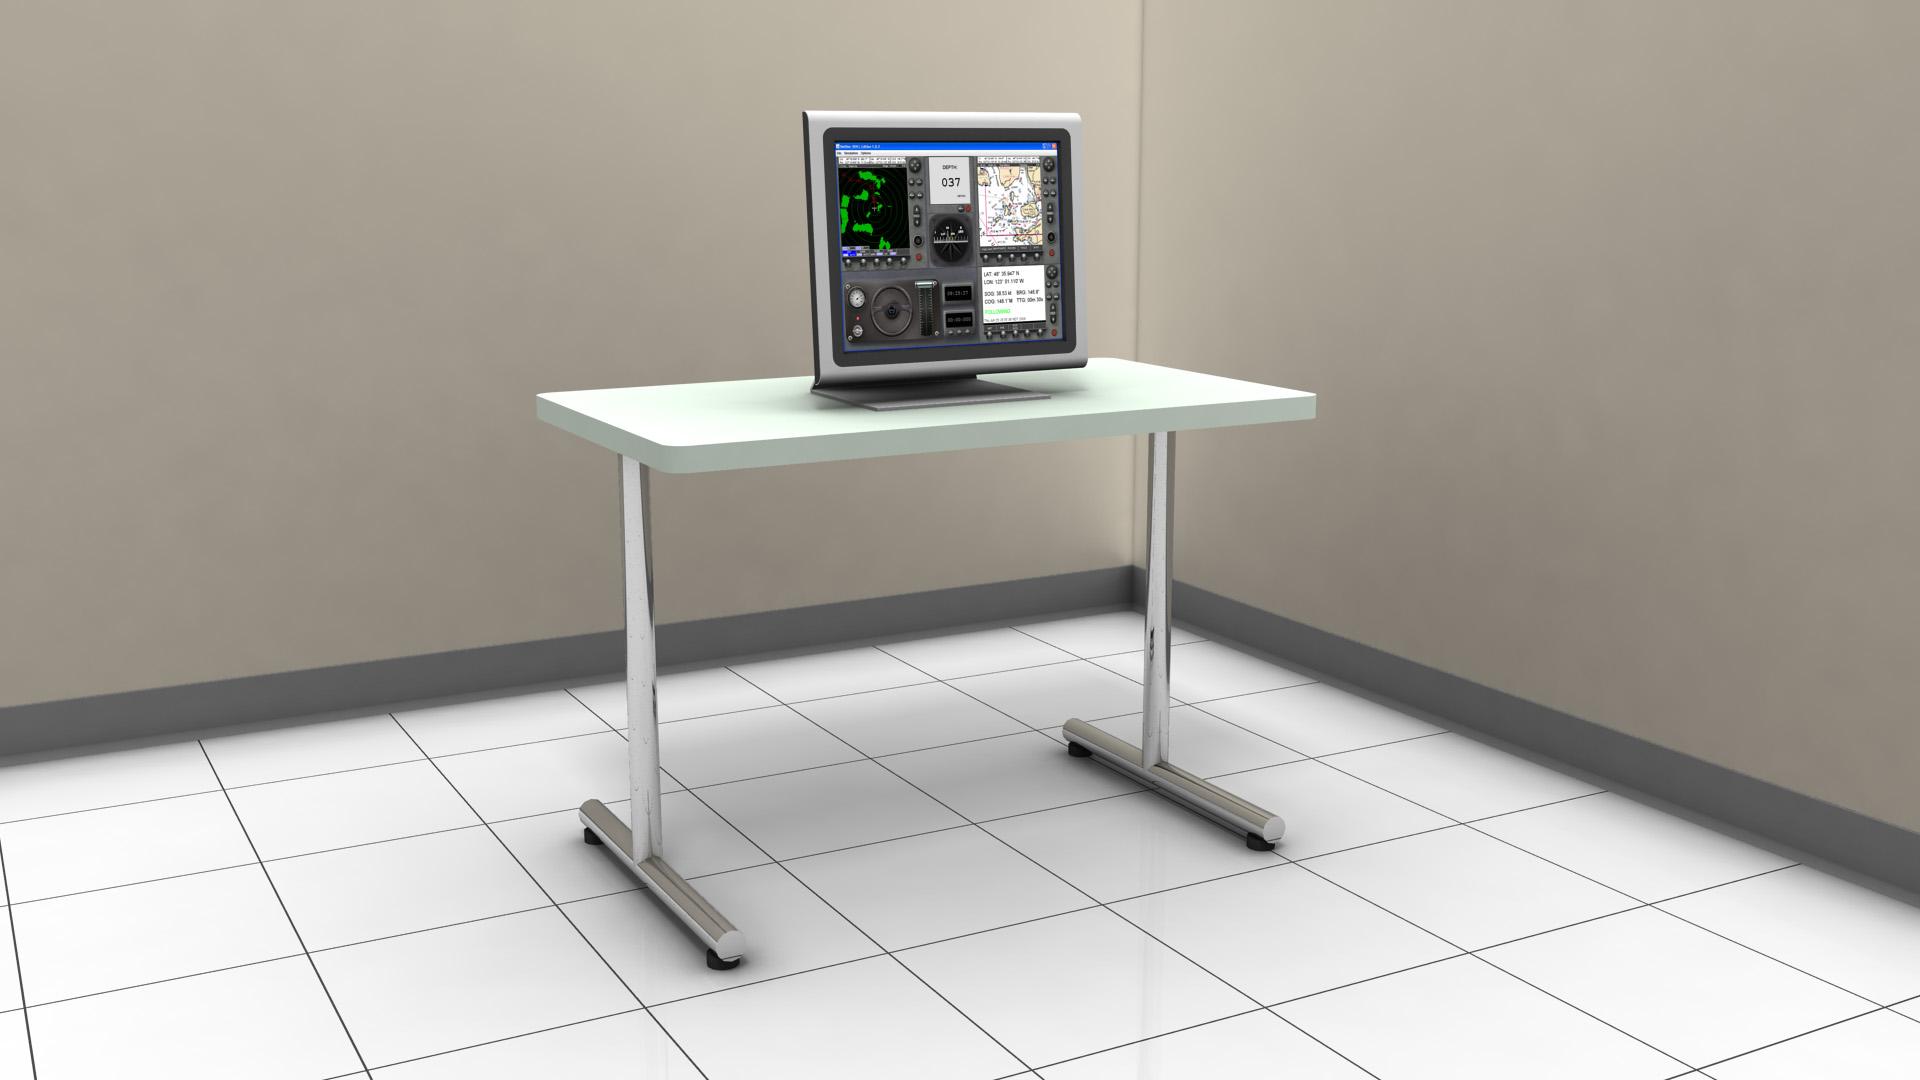 Simulated e-Navigation (SEN-L)